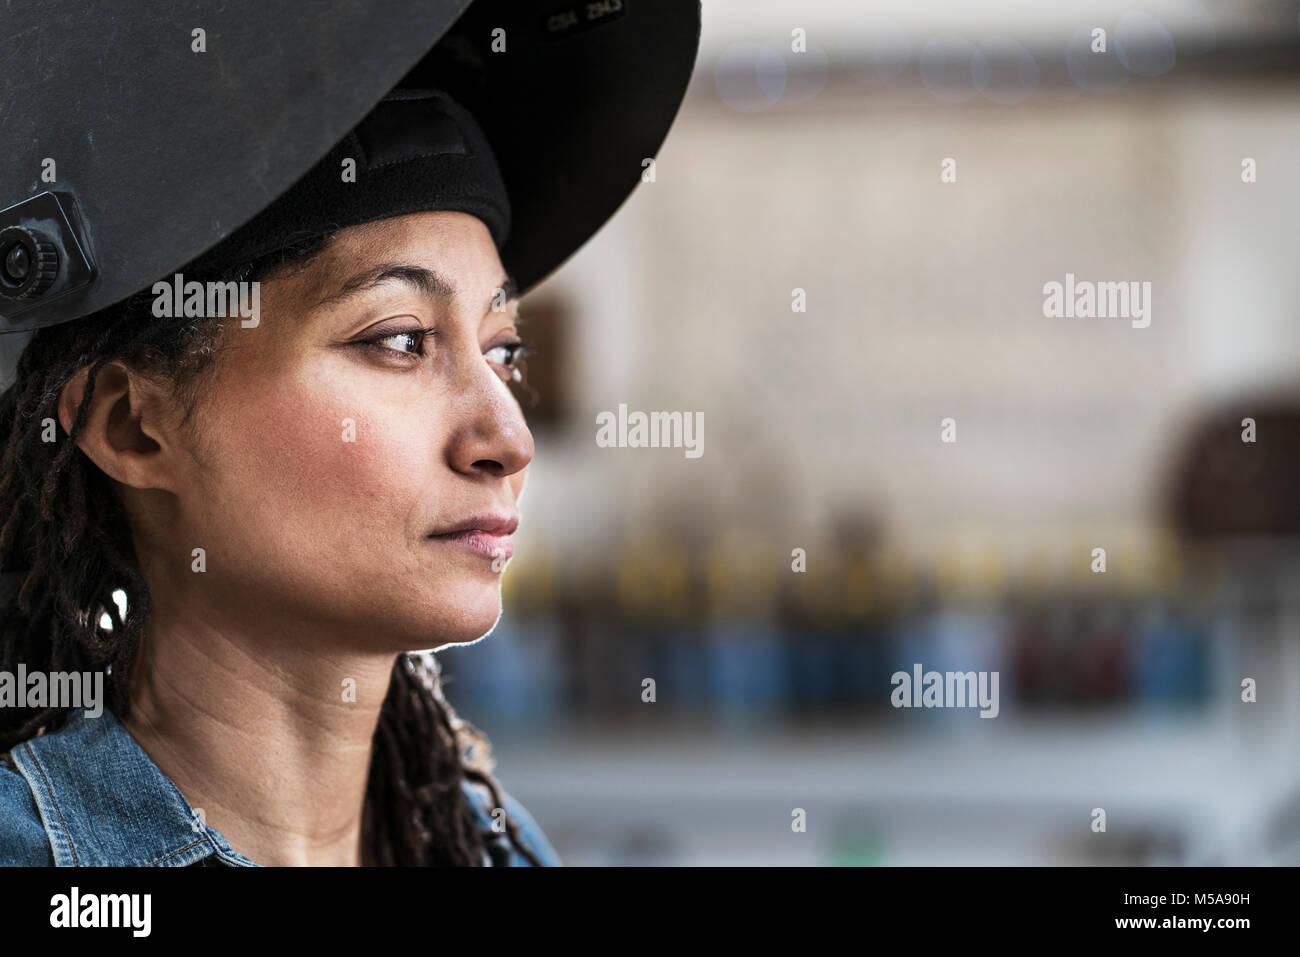 Portrait of woman wearing welding mask standing in metal workshop. - Stock Image